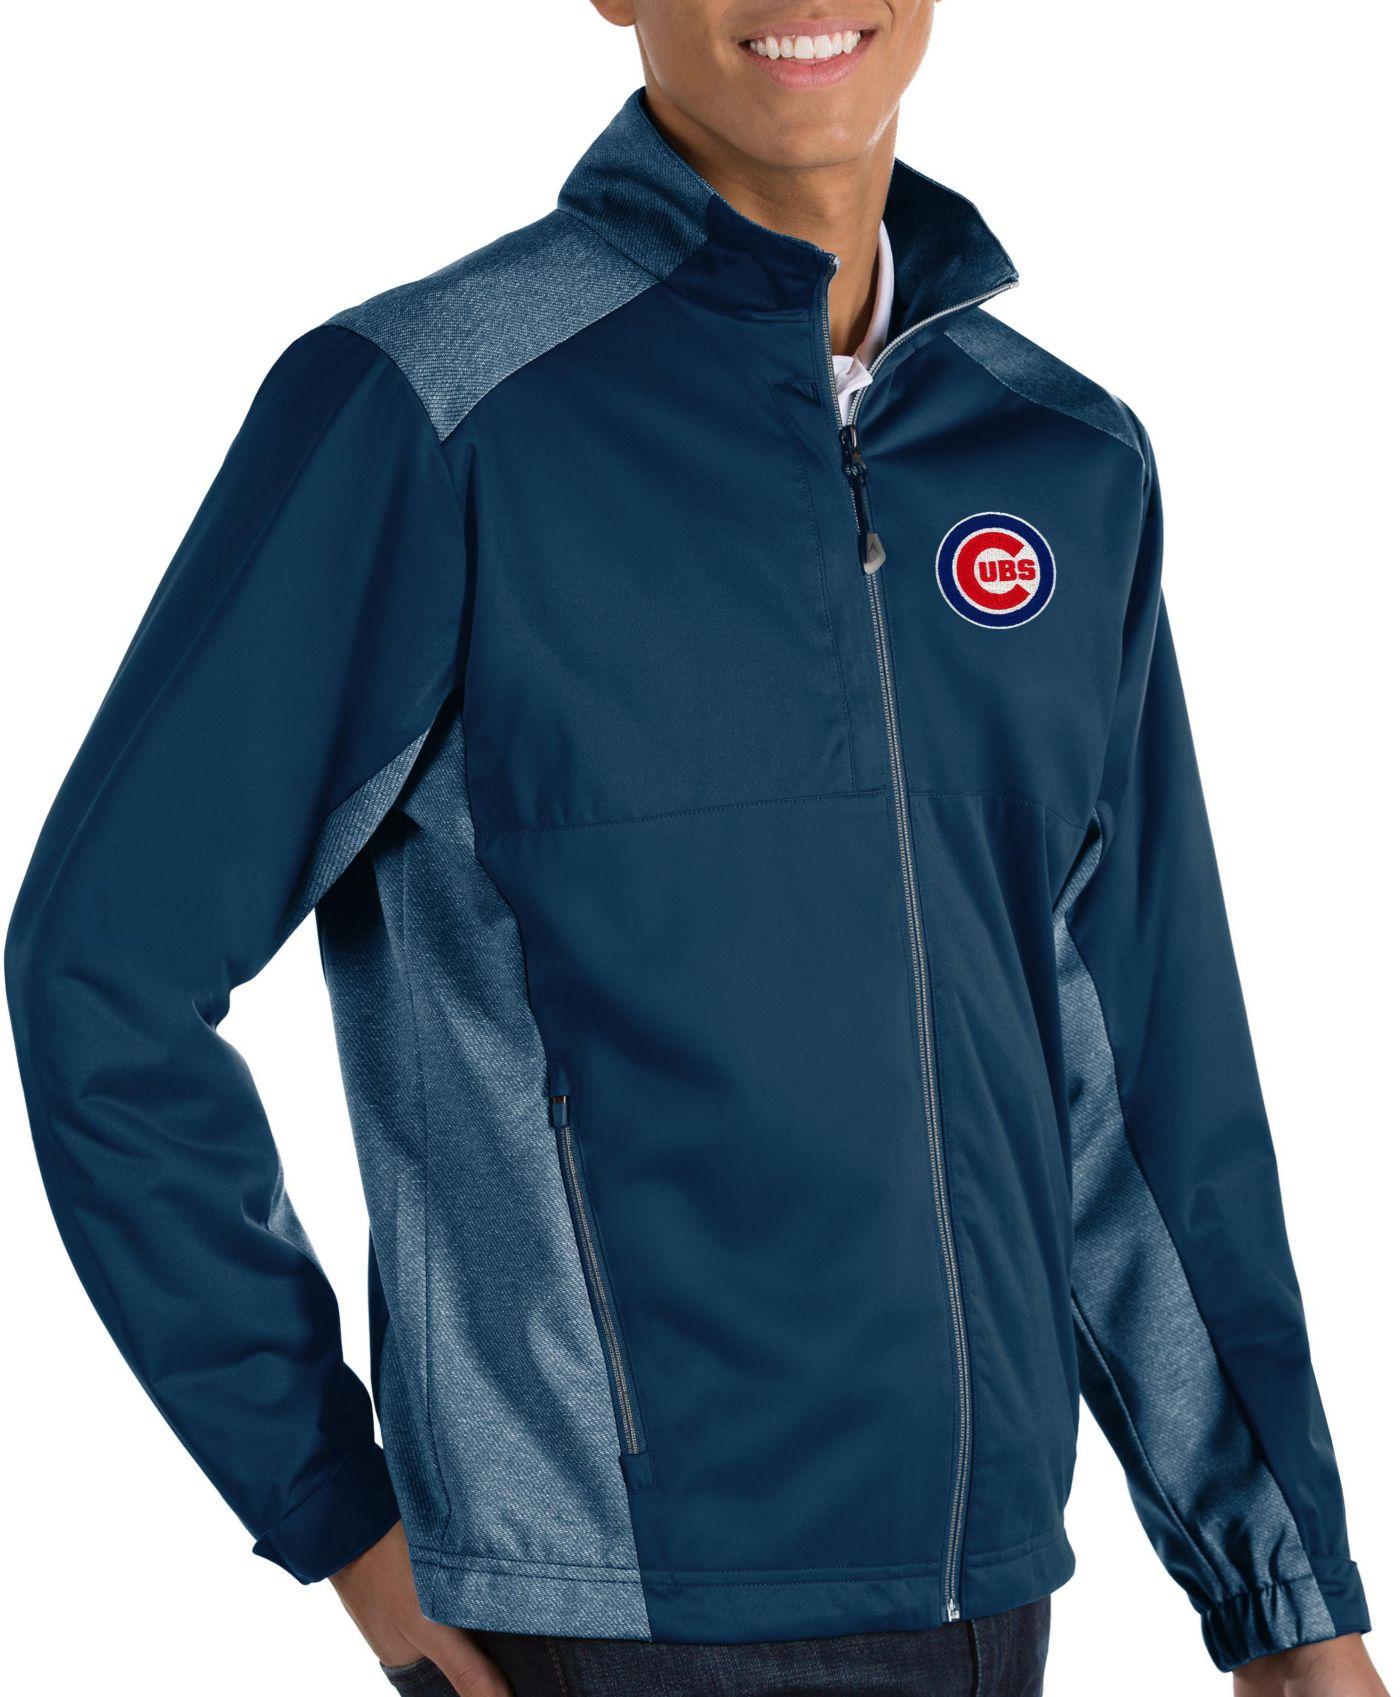 Antigua Men's Chicago Cubs Revolve Navy Full-Zip Jacket